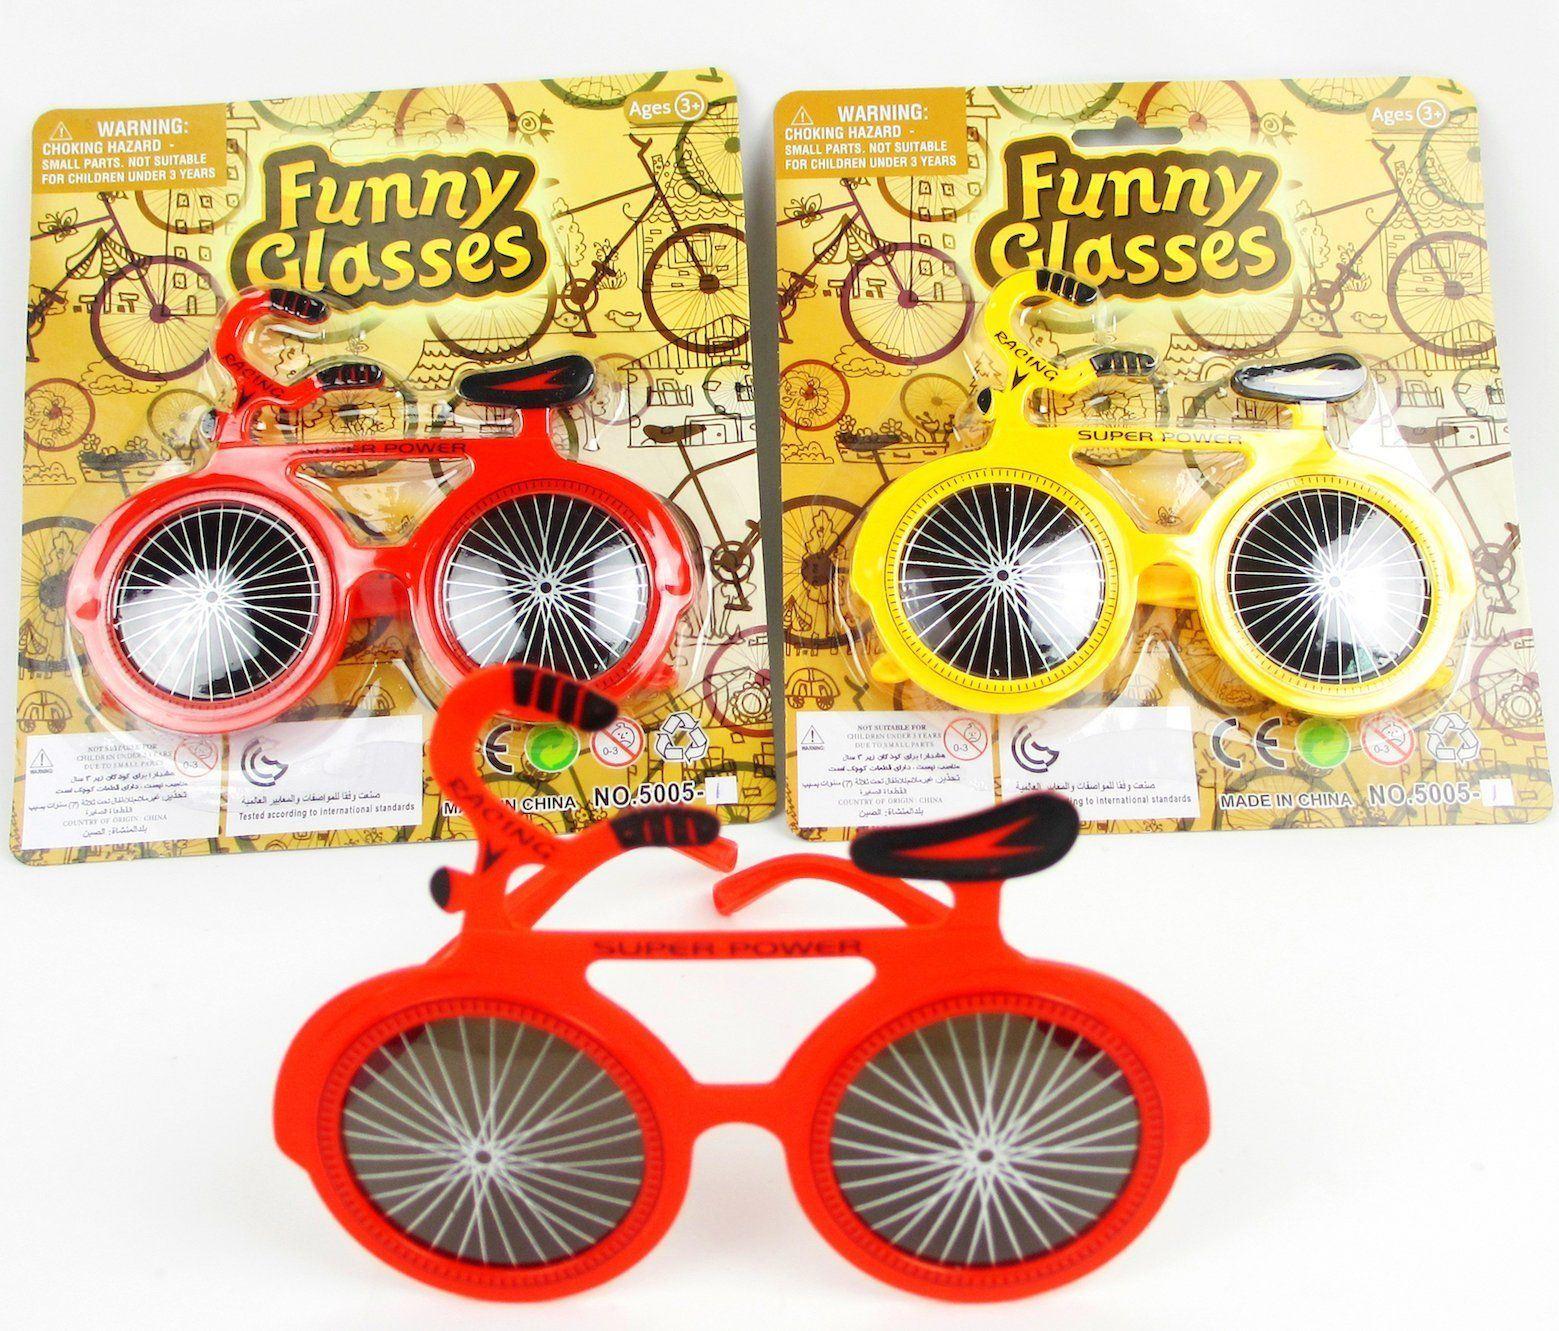 thumbnail 49 - Glasses Joke Sunglasses Fancy Dress Costume Party Fun Photo Booth Prop 1-12Pcs